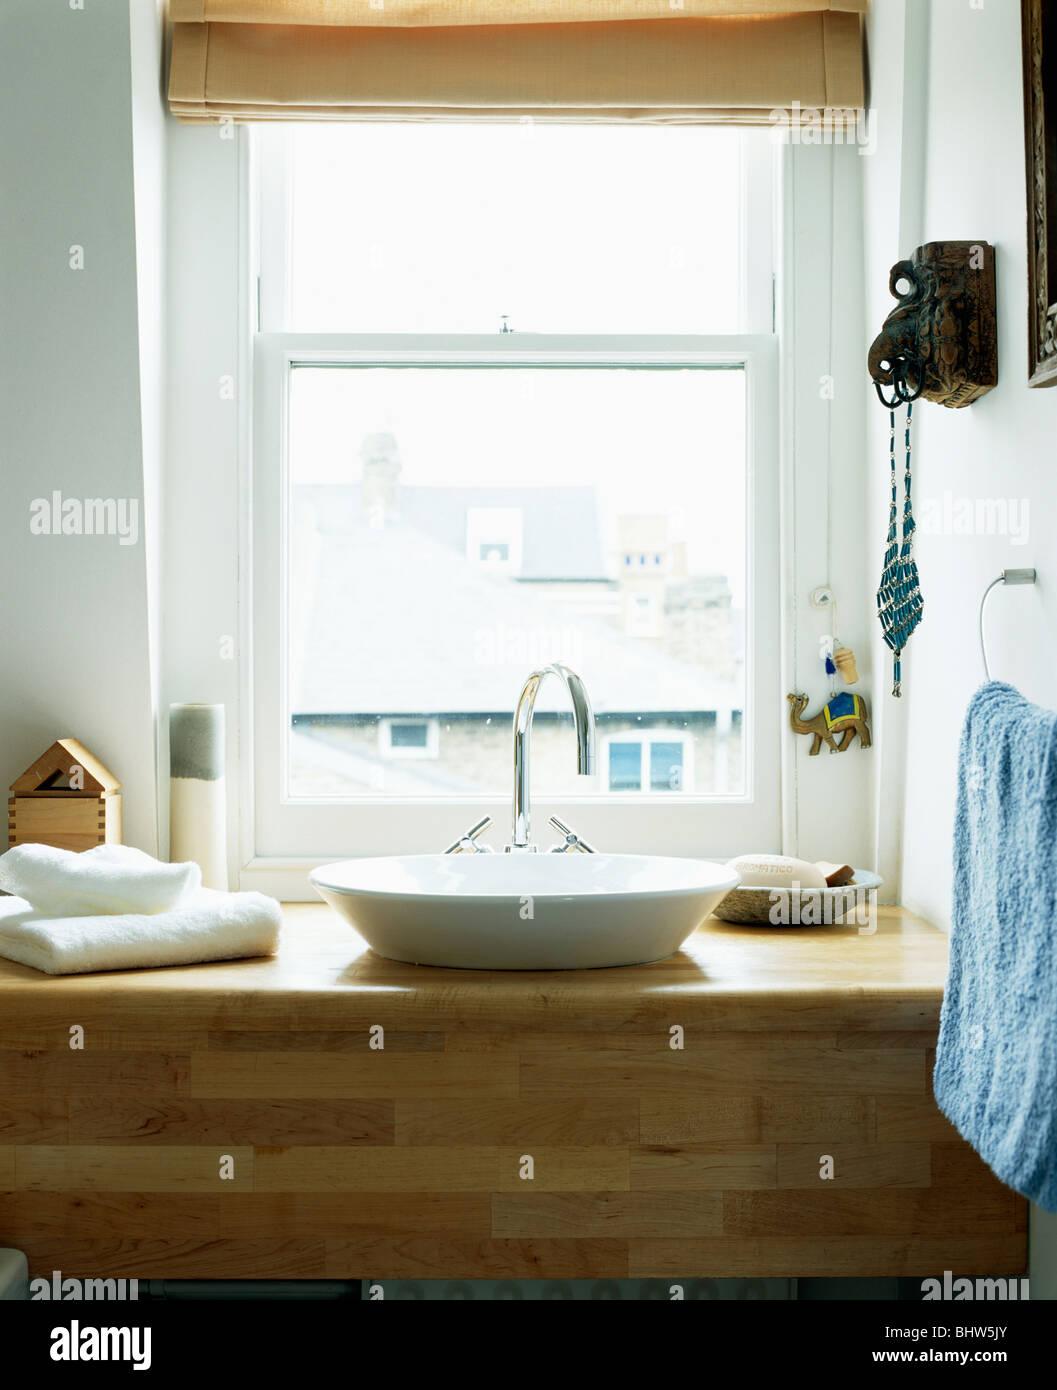 Modern White Bowl Basin On Wooden Vanity Unit Below Window In Small Stock Photo Alamy